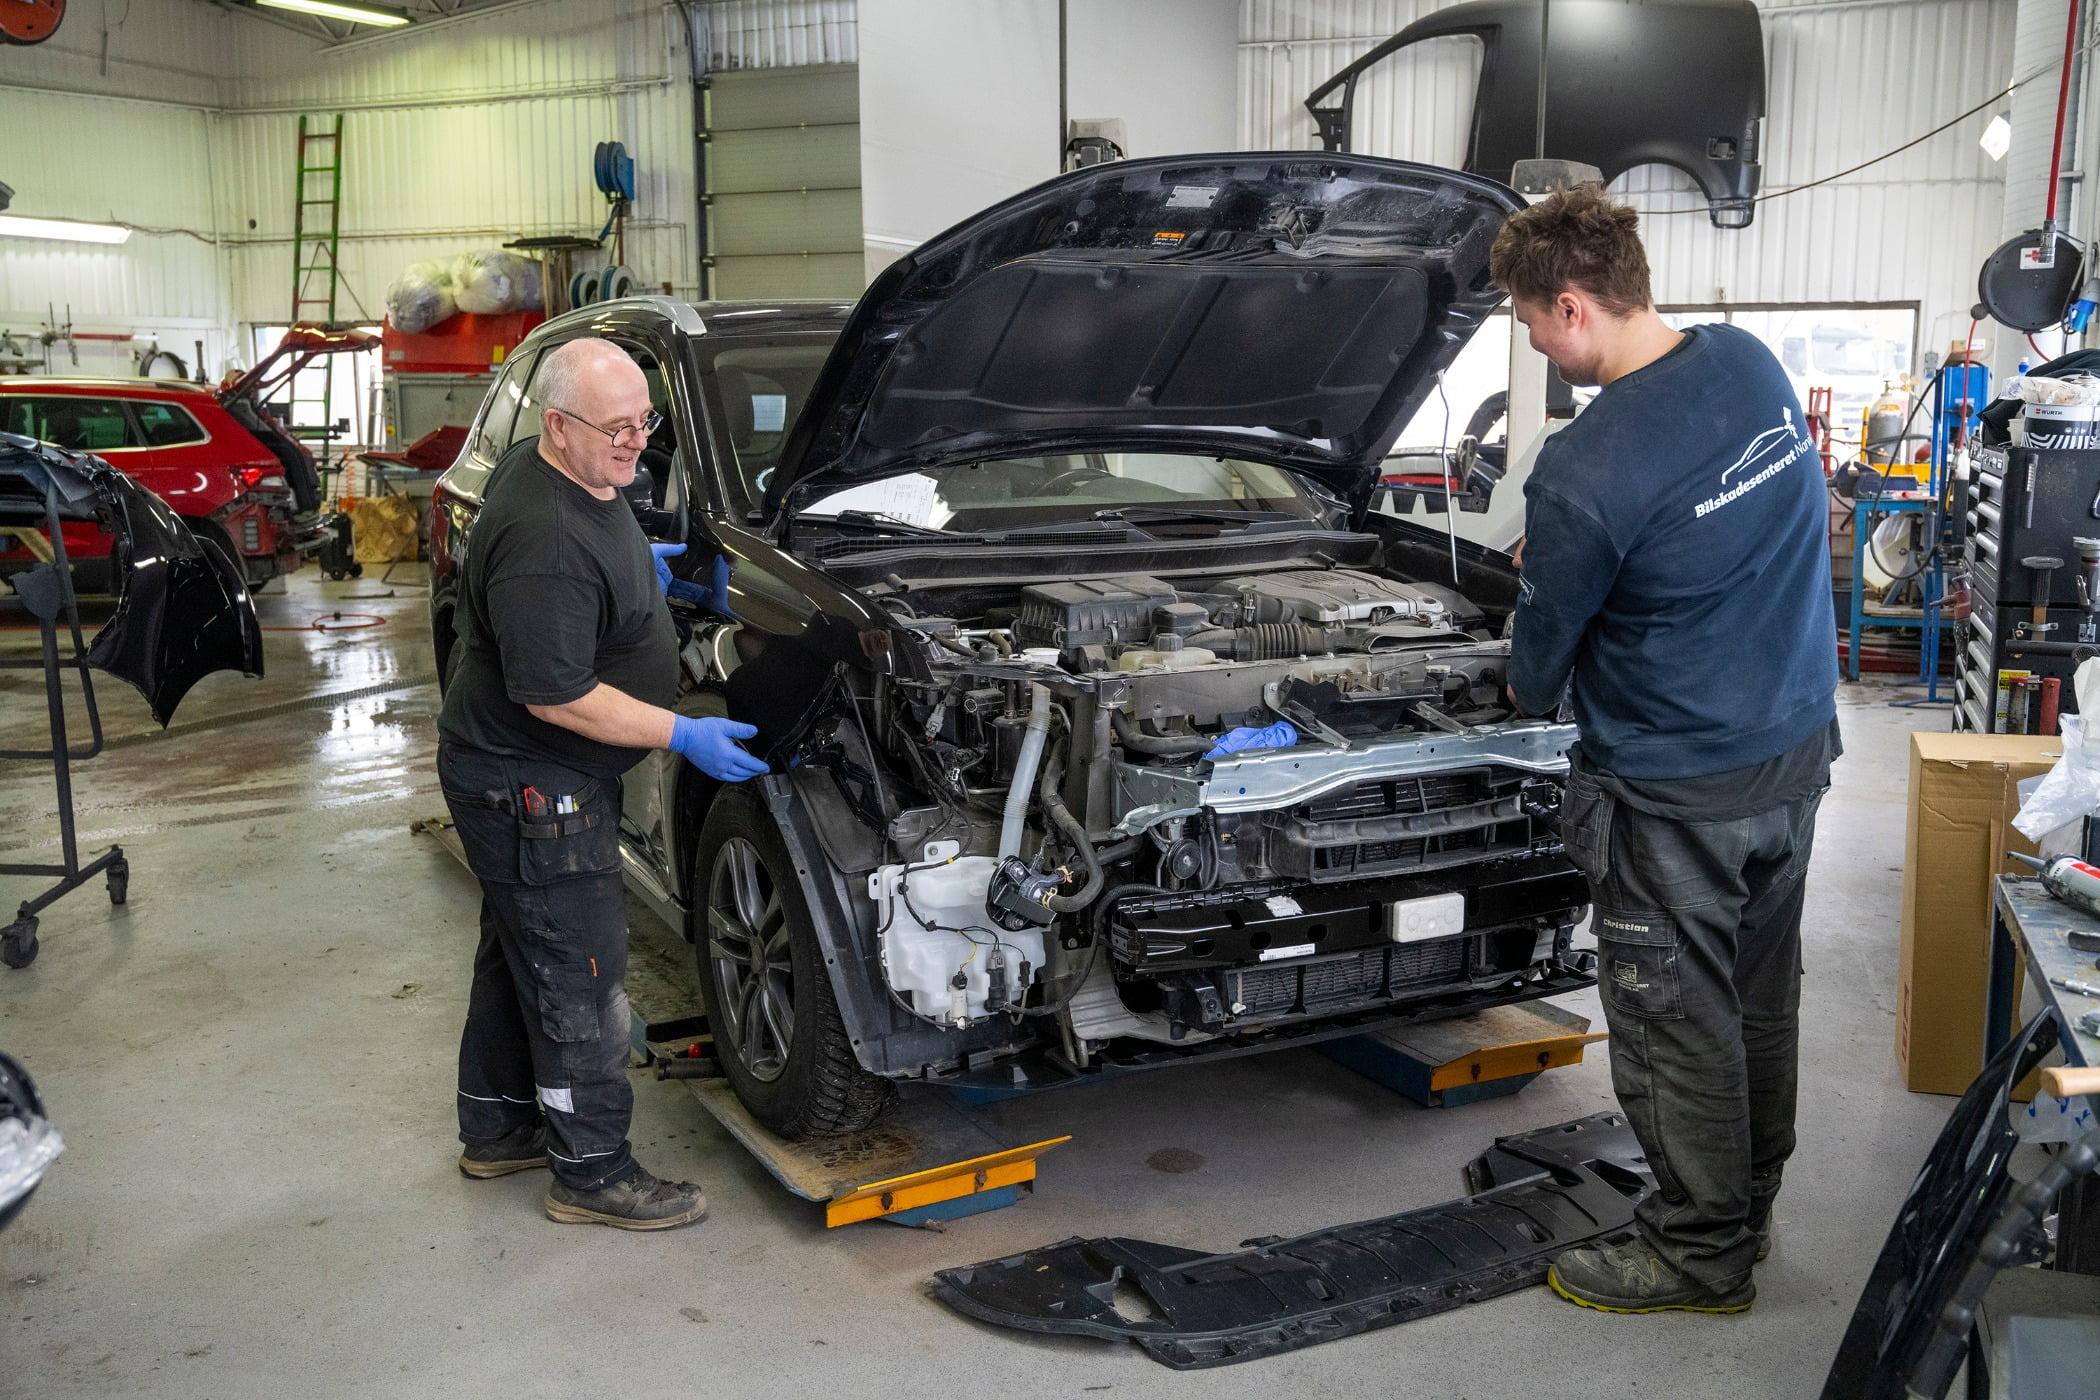 Motor vehicle, Automotive tire, Auto mechanic, Car, Hood